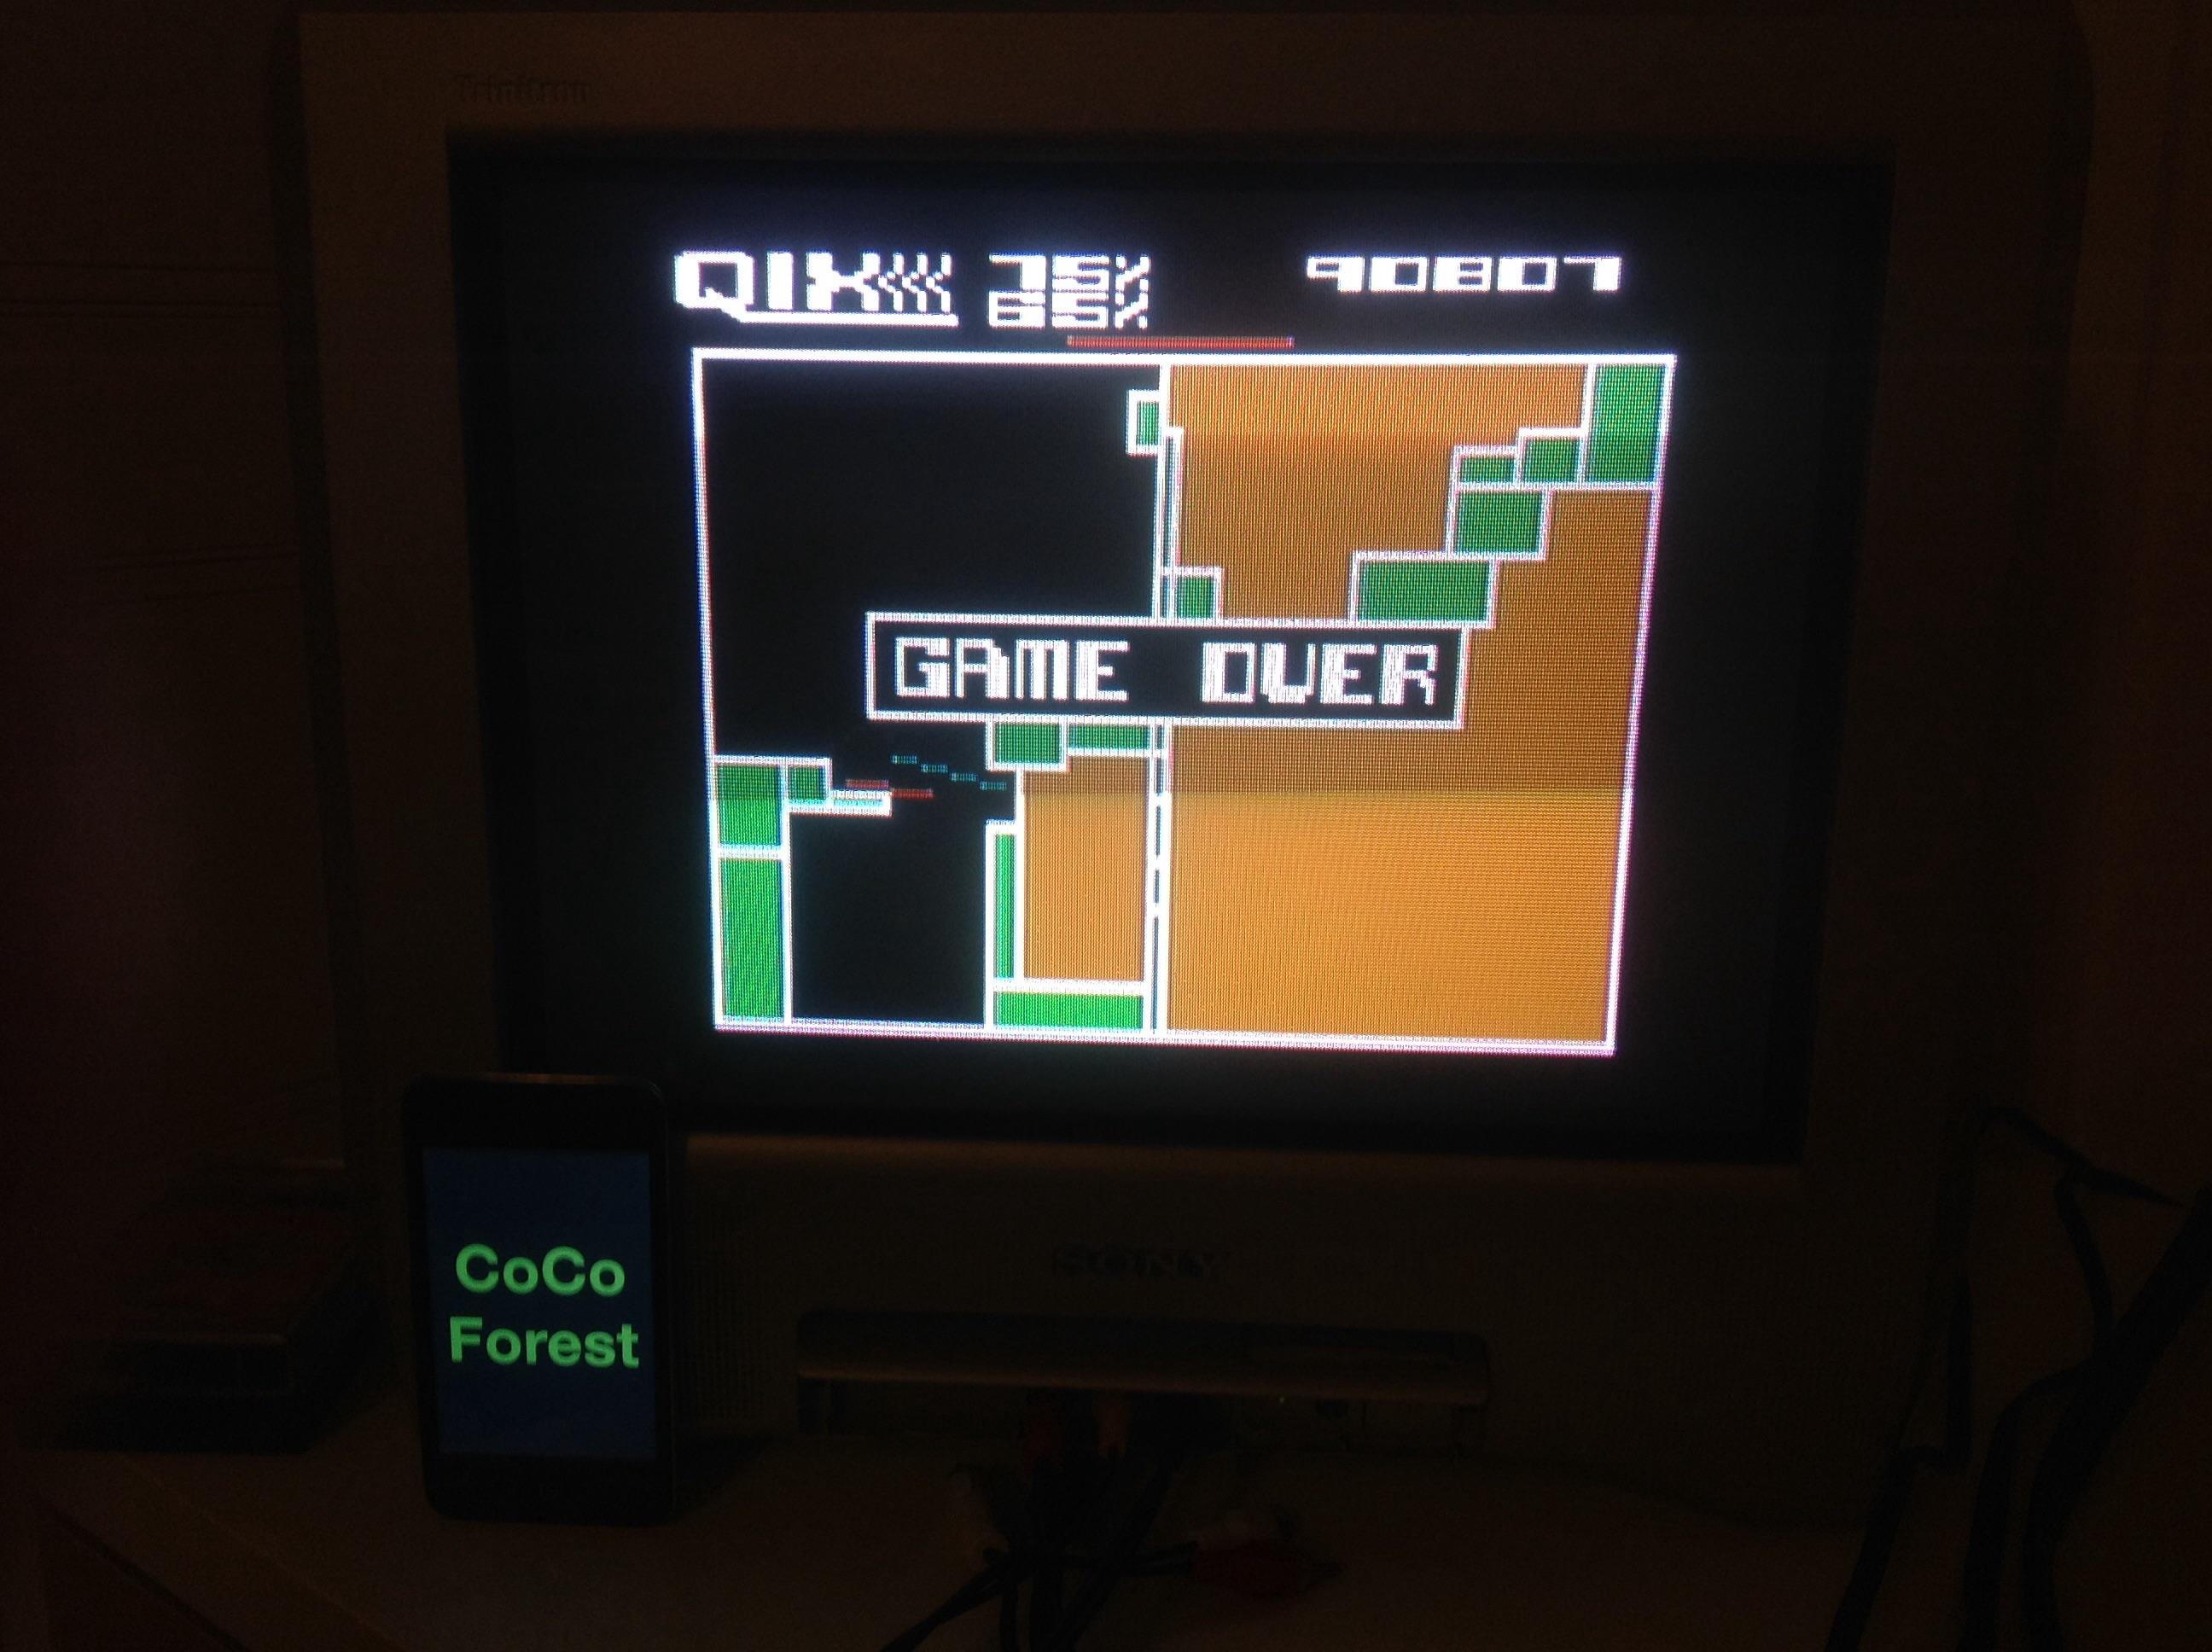 CoCoForest: Qix: Advanced (Atari 5200) 90,807 points on 2014-11-03 11:09:42